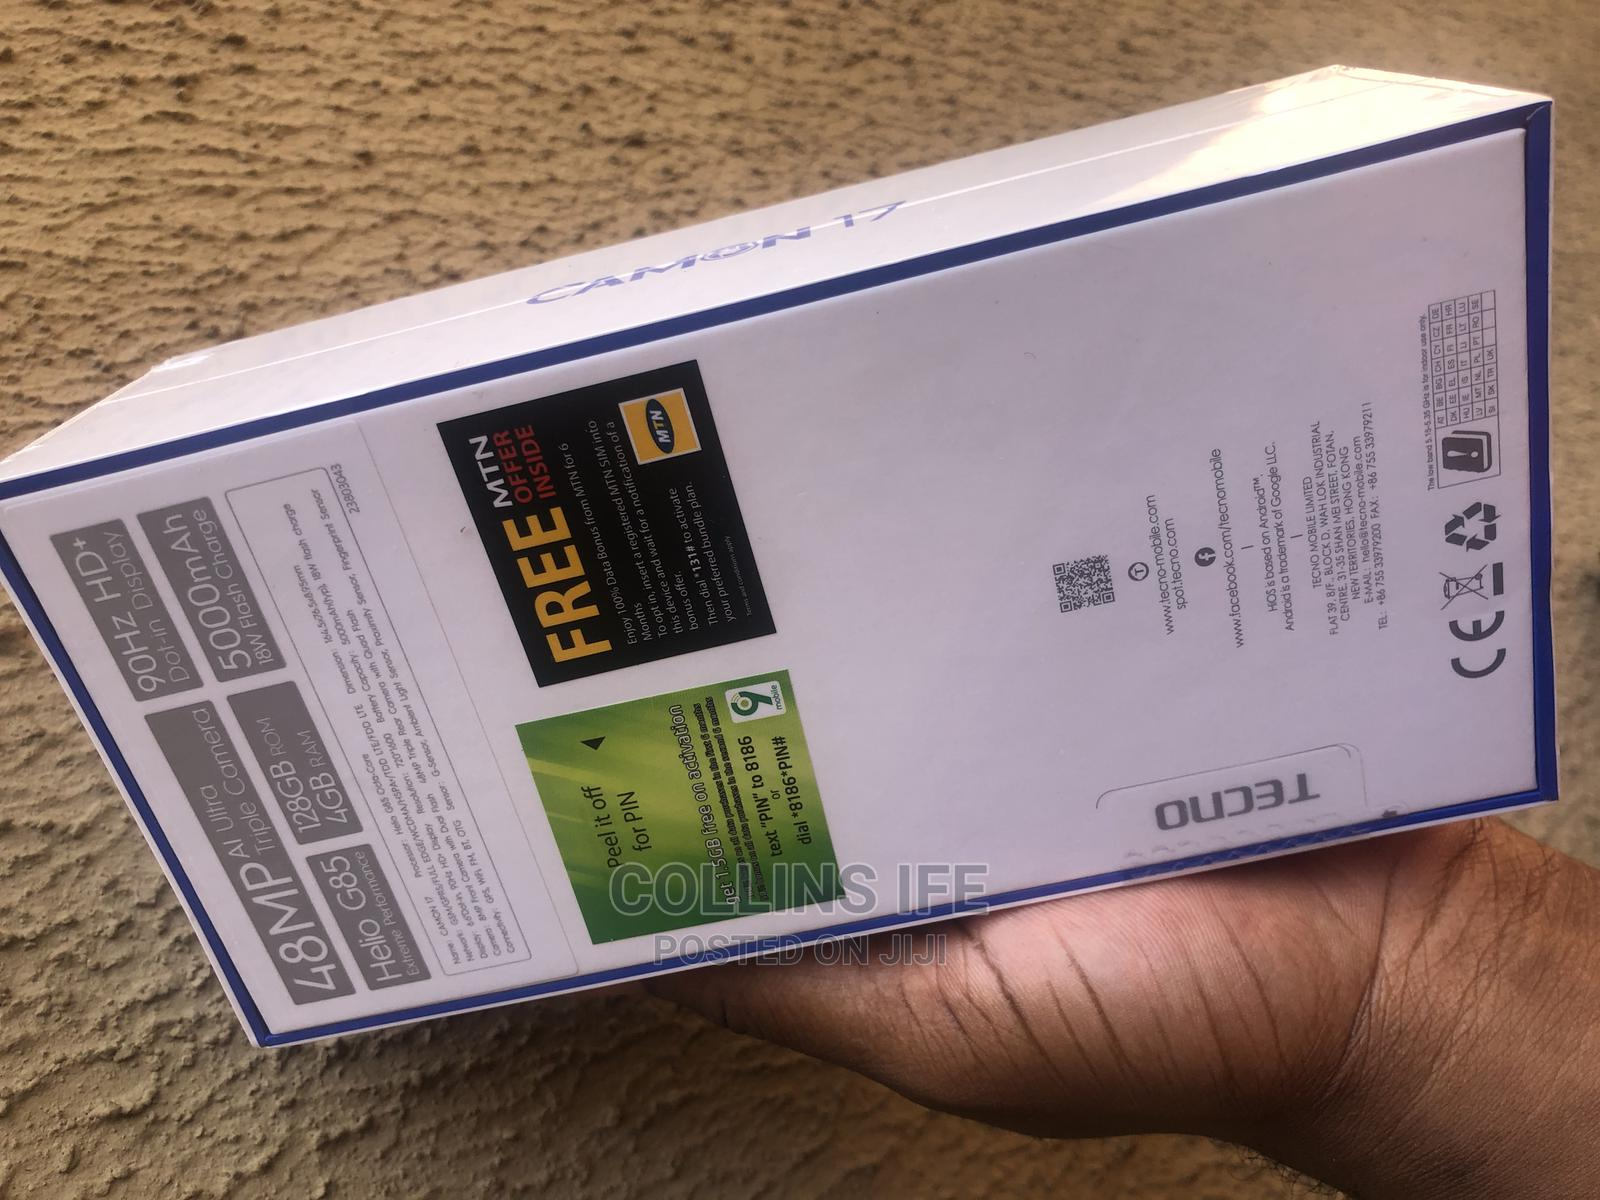 New Tecno Camon 17 128 GB Blue | Mobile Phones for sale in Enugu, Enugu State, Nigeria